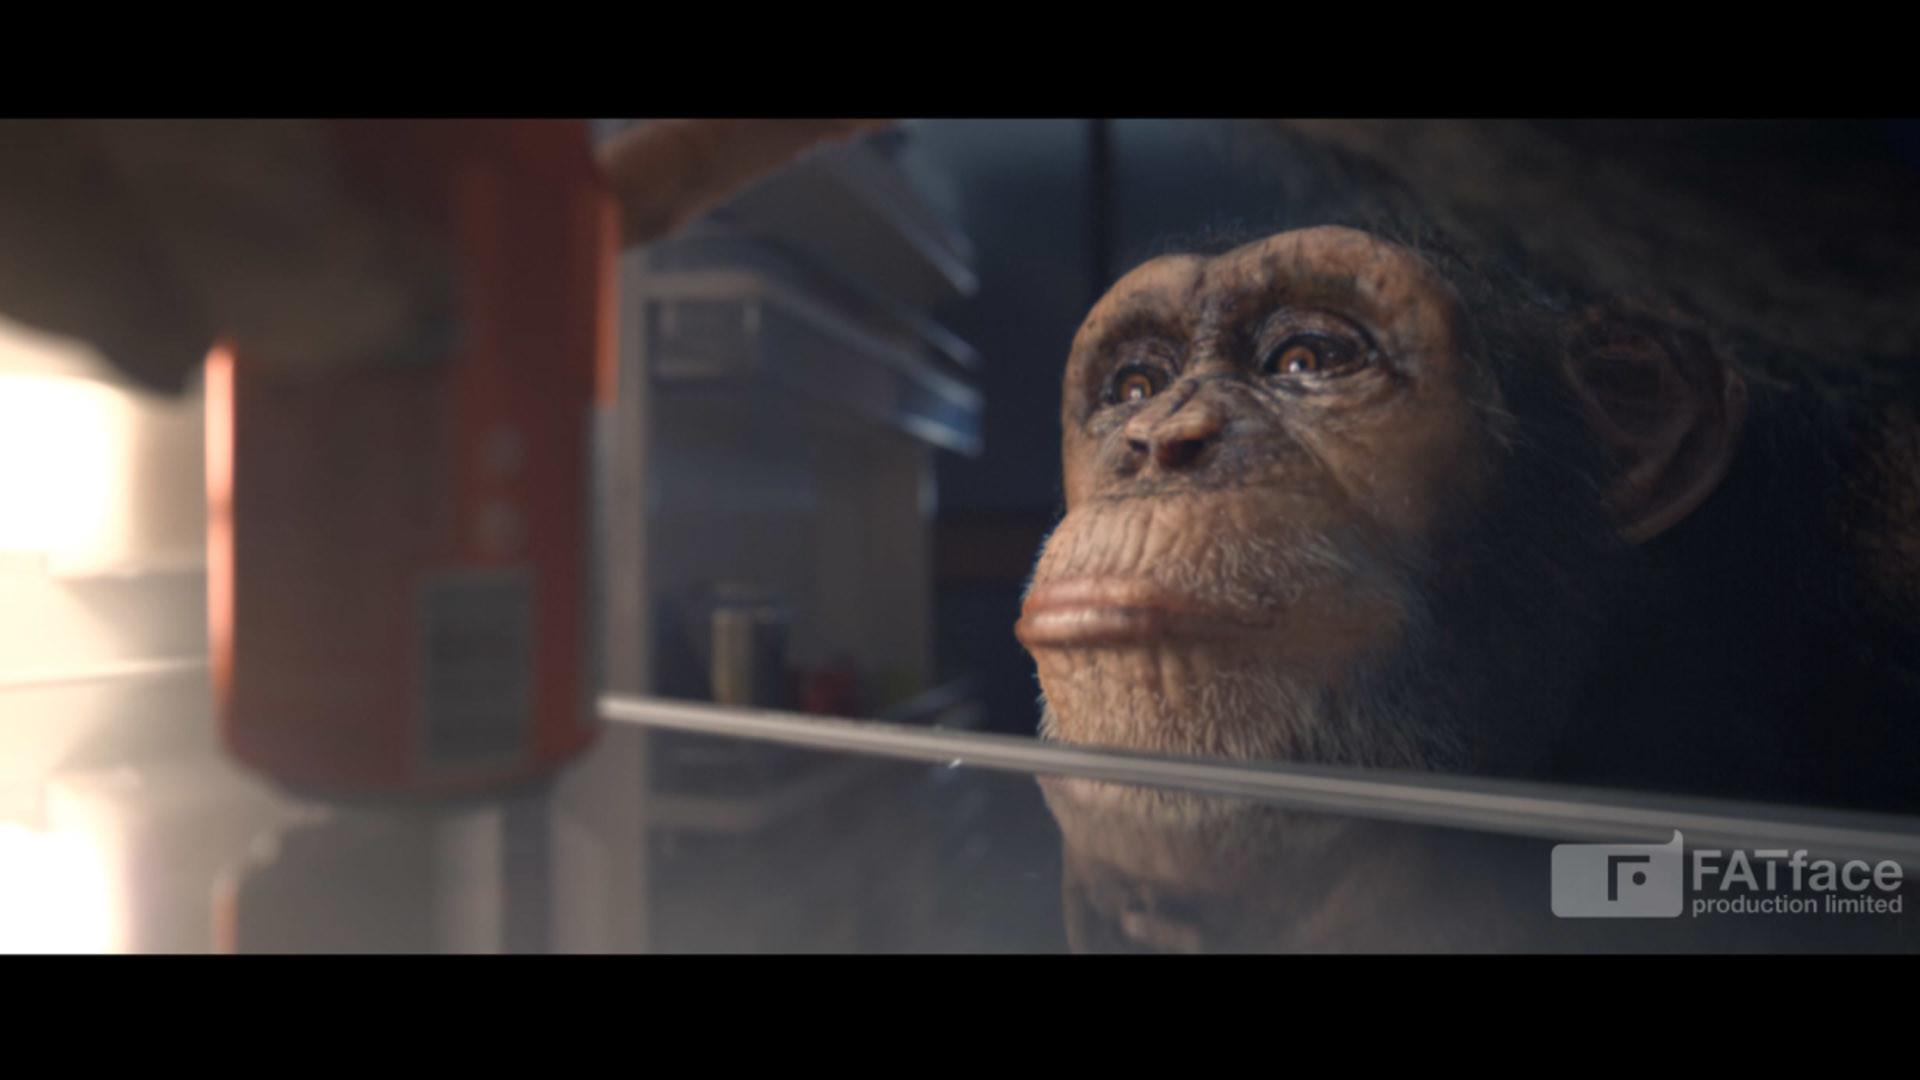 Nelson tai chimpanzee dsgn screens 001d